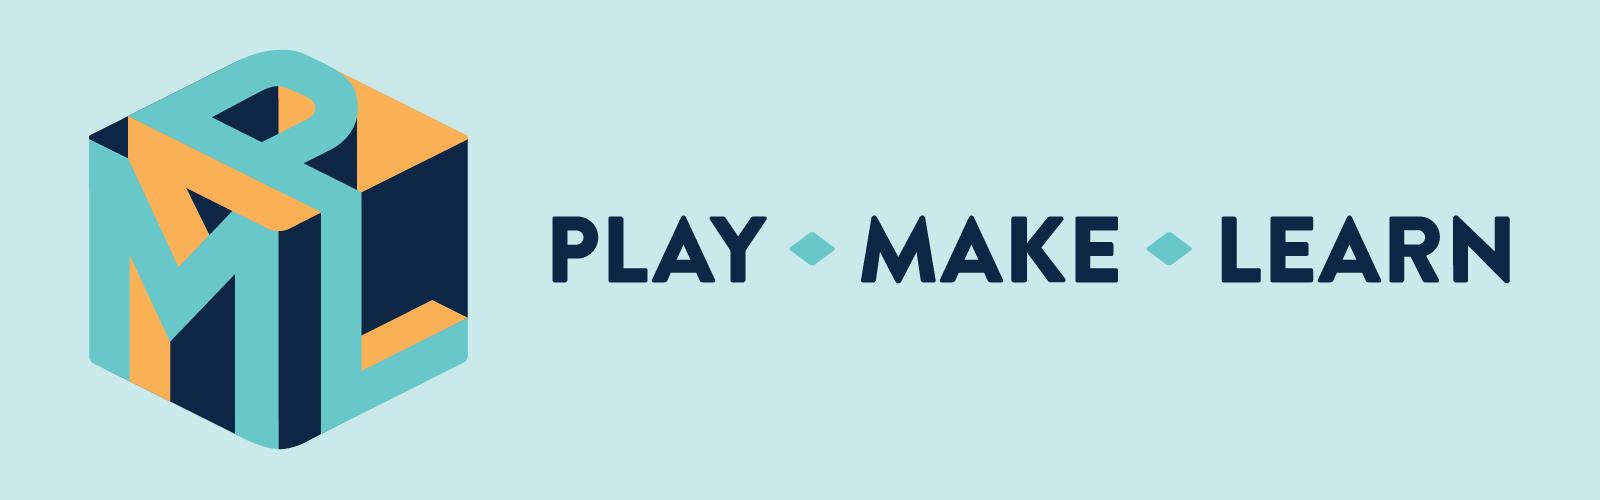 Play Make Learn Home page Hero Image